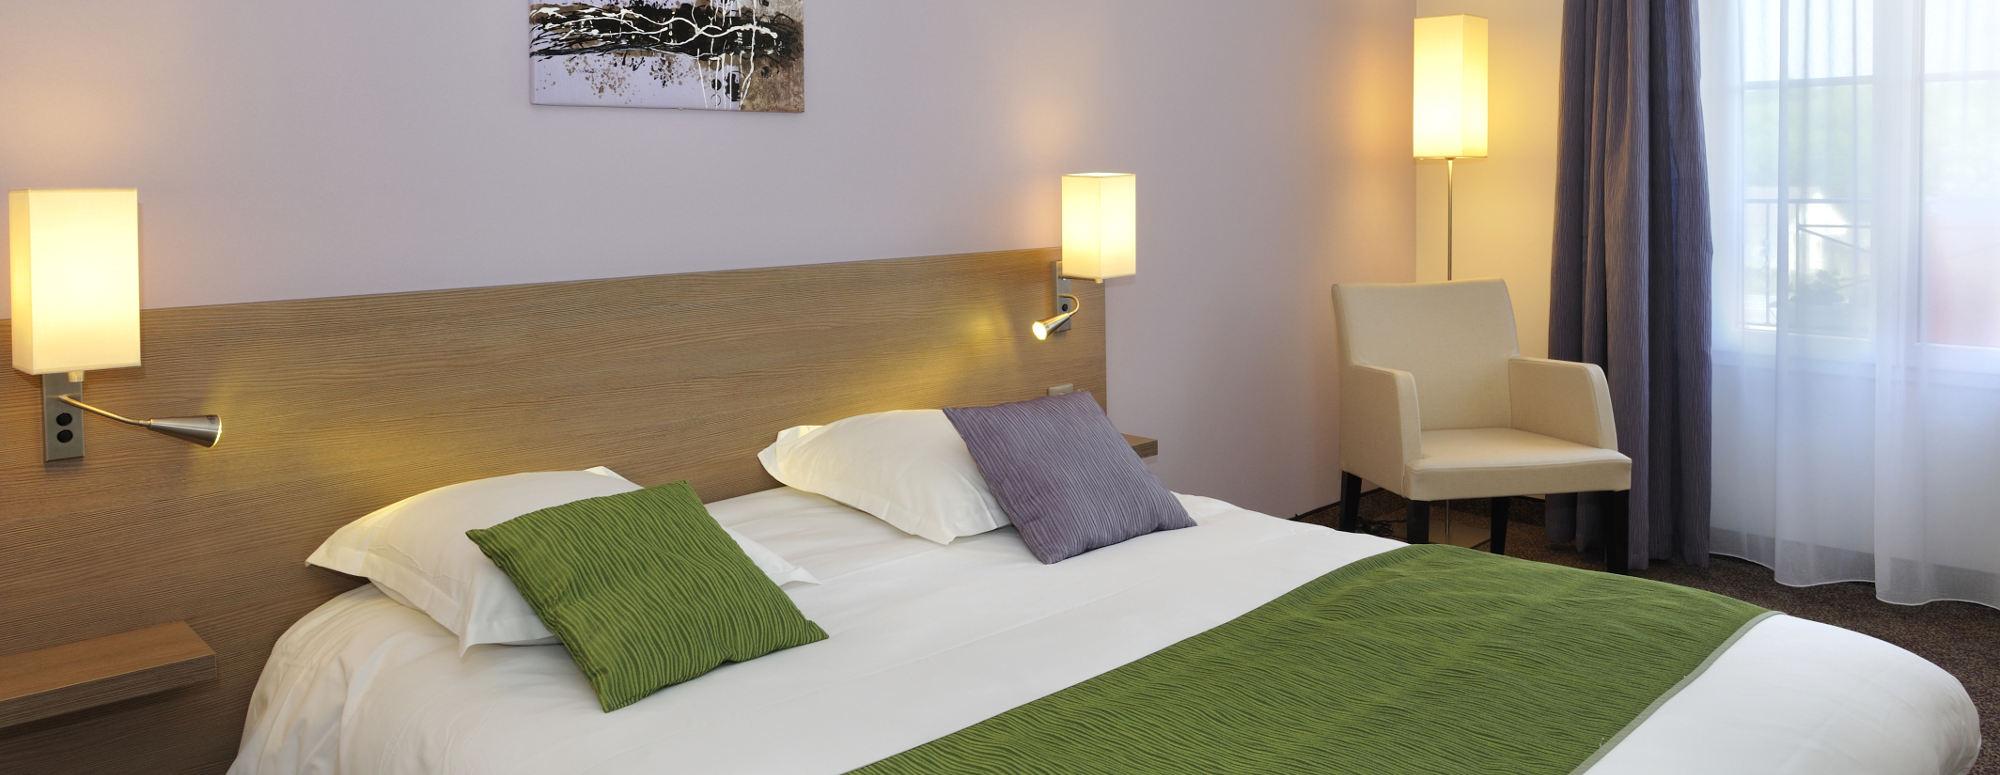 Chambre confort hôtel 3 *